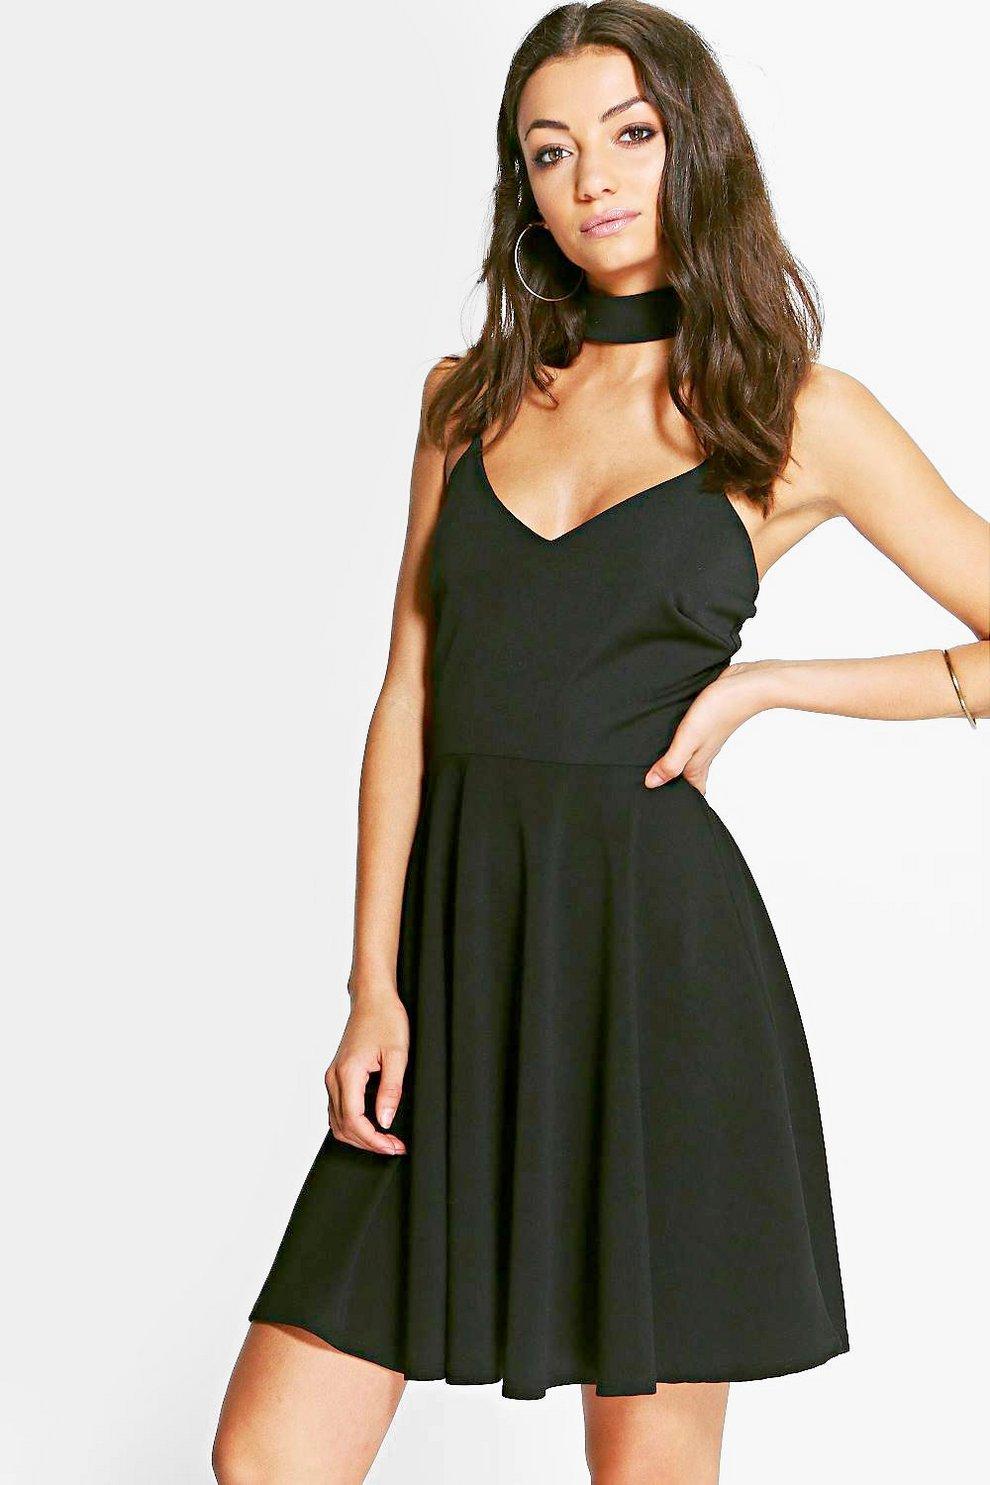 c5249d47f79da Tall Sadie Detachable Choker Strappy Skater Dress | Boohoo